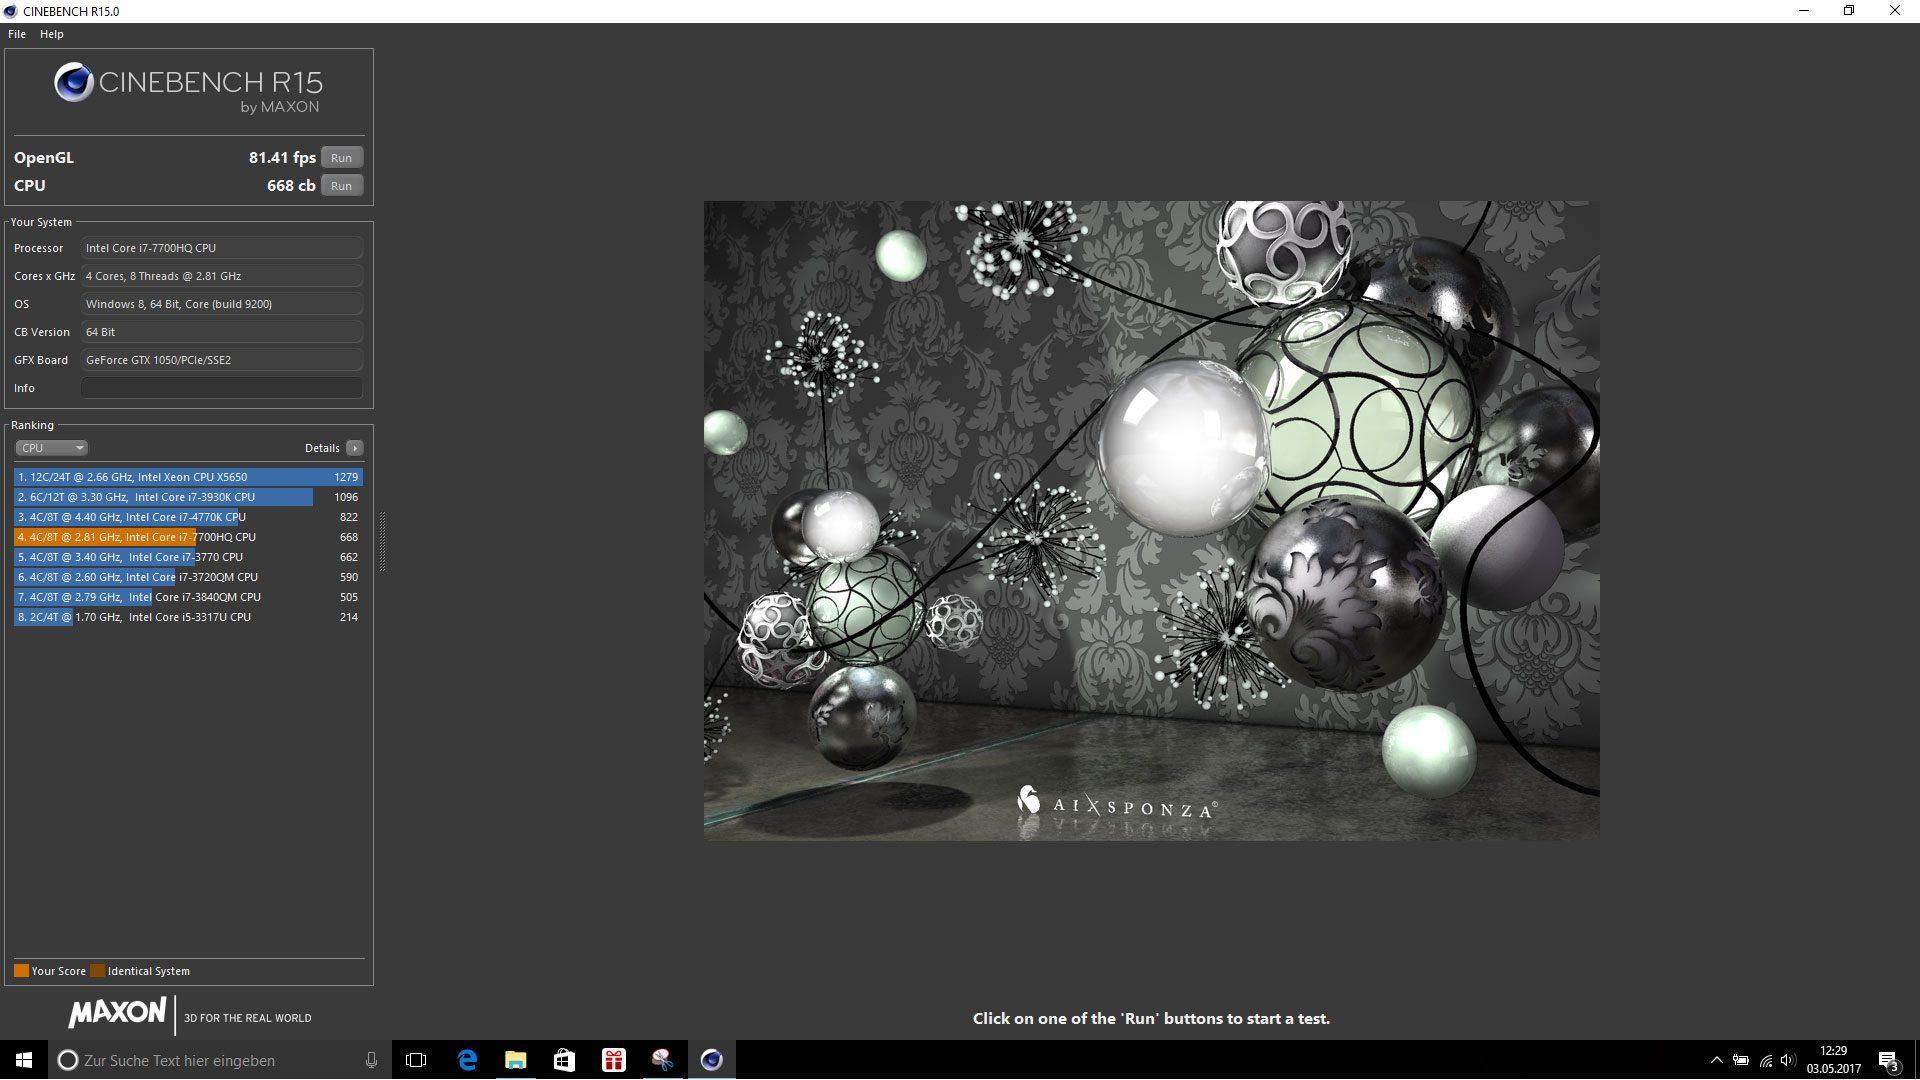 Asus Strix GL753VD-GC044T Benchmark_8